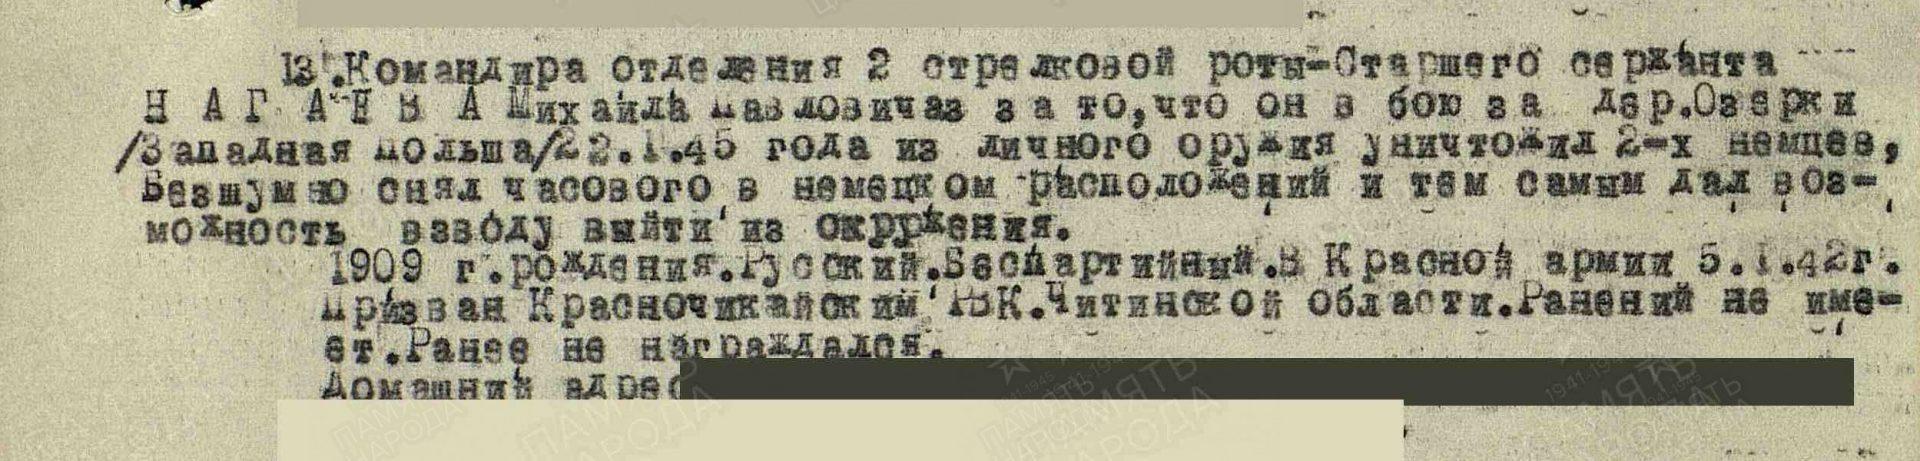 Нагаев Михаил Павлович